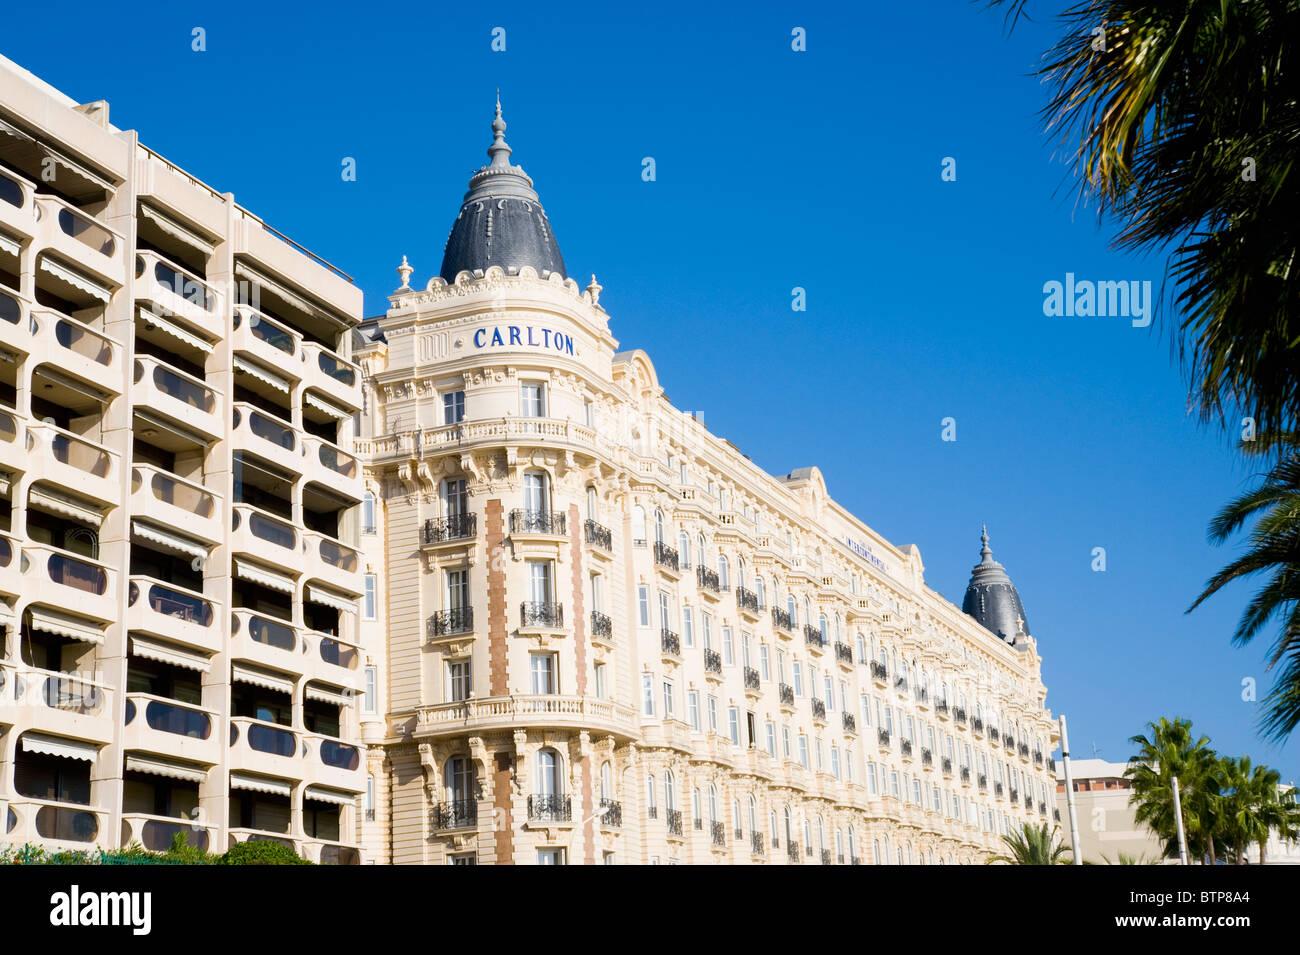 Carlton Hotel, Cannes, Cote D'Azur, France - Stock Image